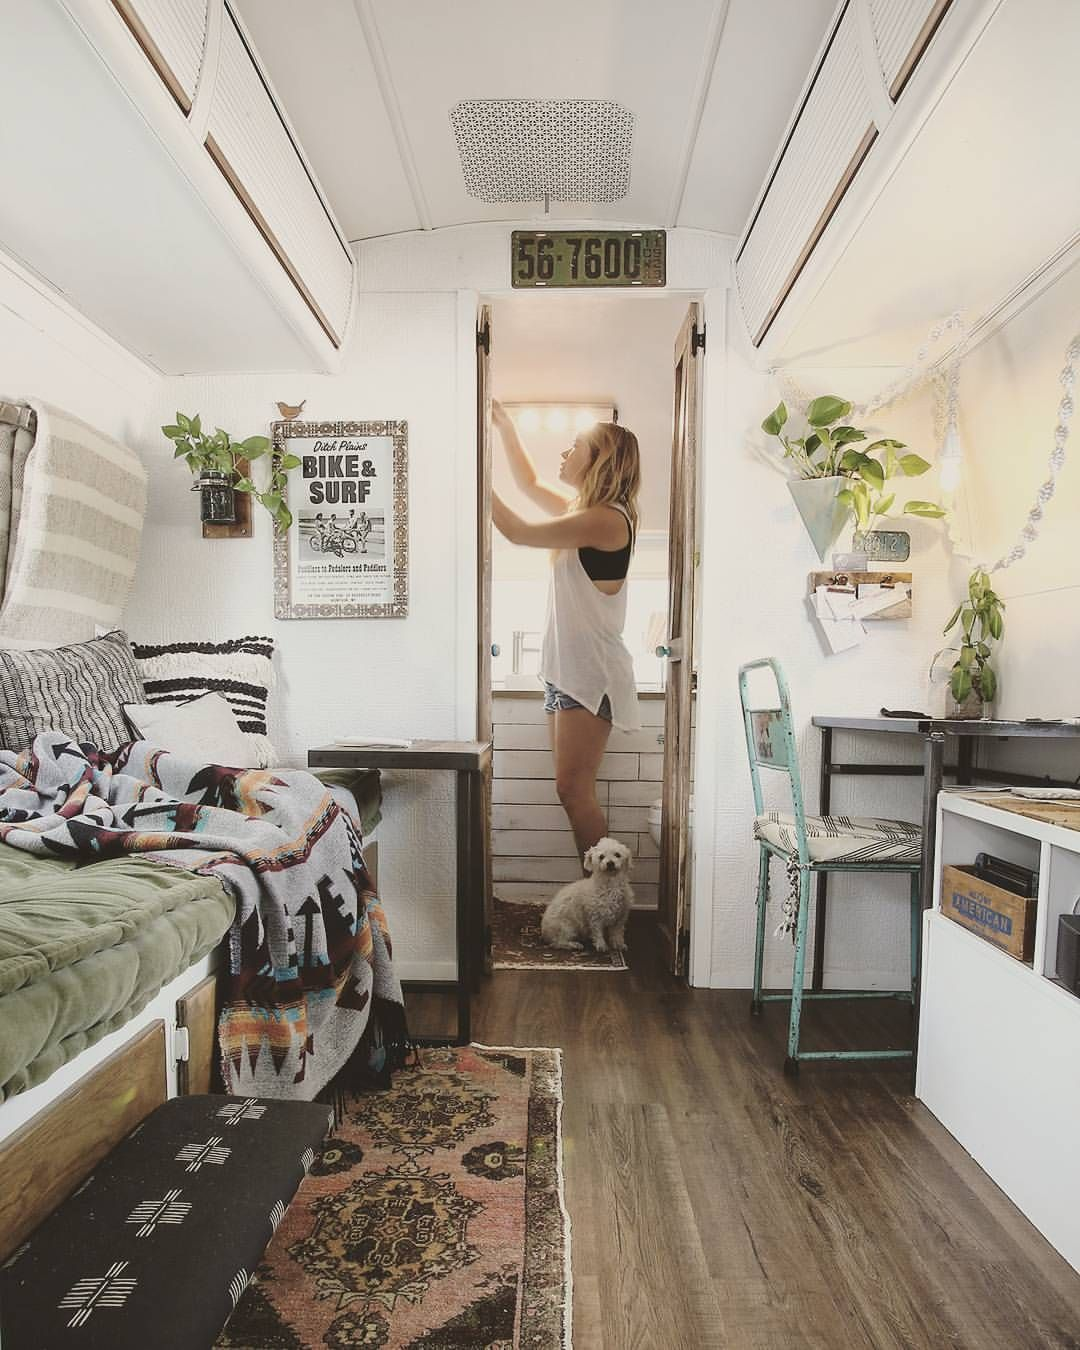 Airstream 24 | airstream ideas | Remodeled campers, Camper